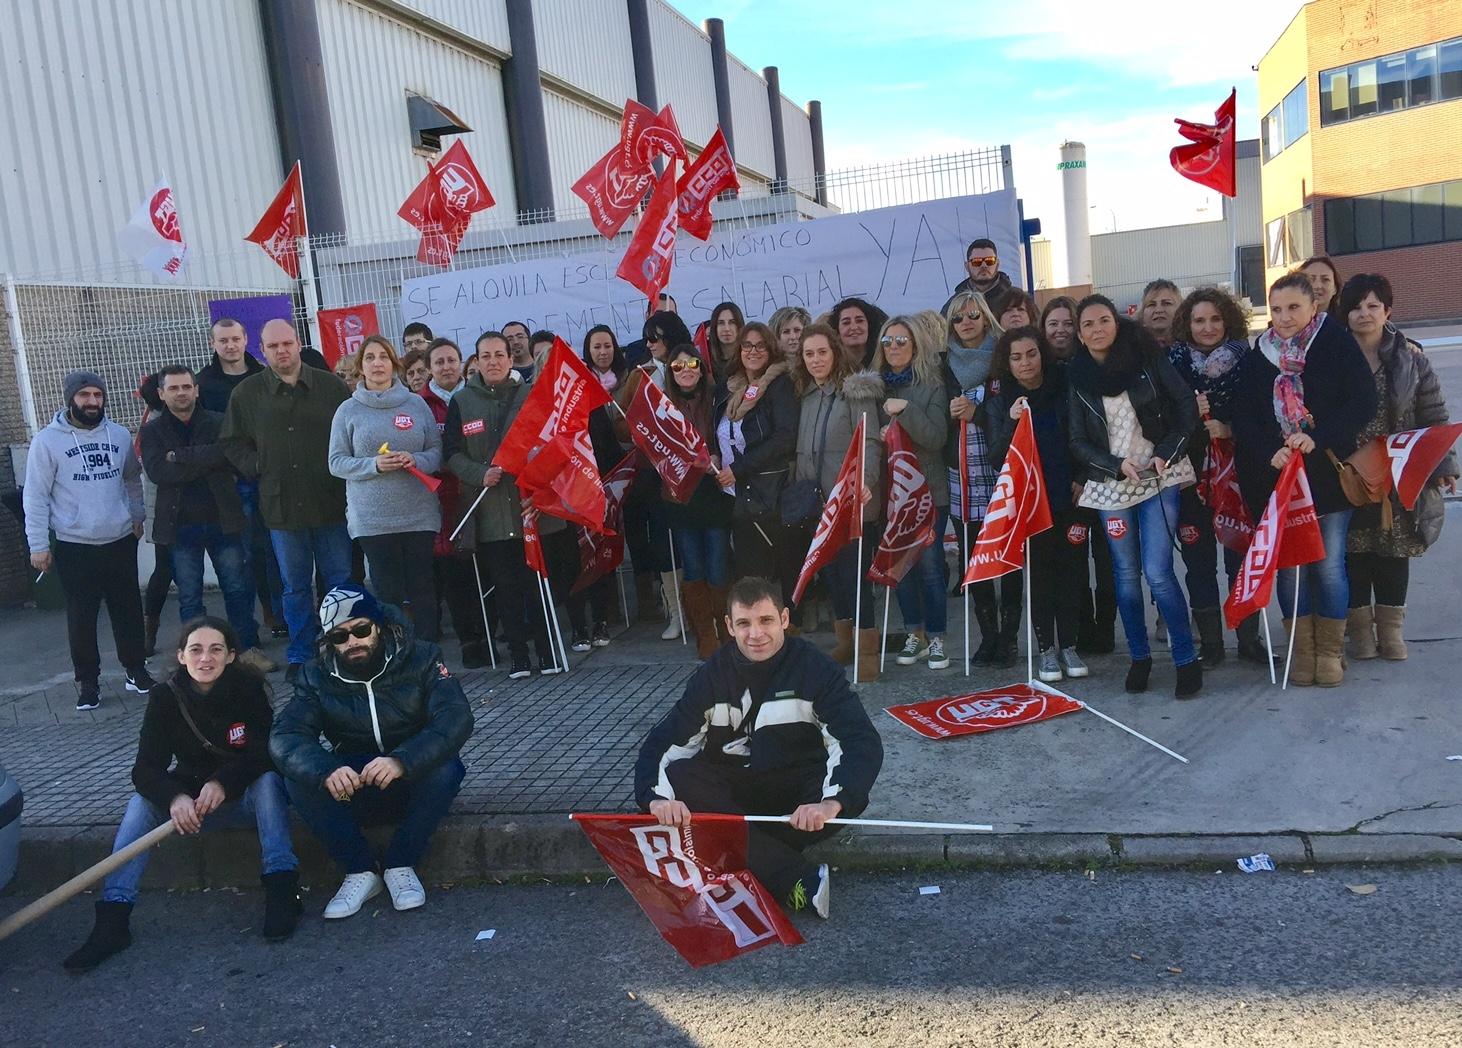 huelga-britor-1-de-diciembre